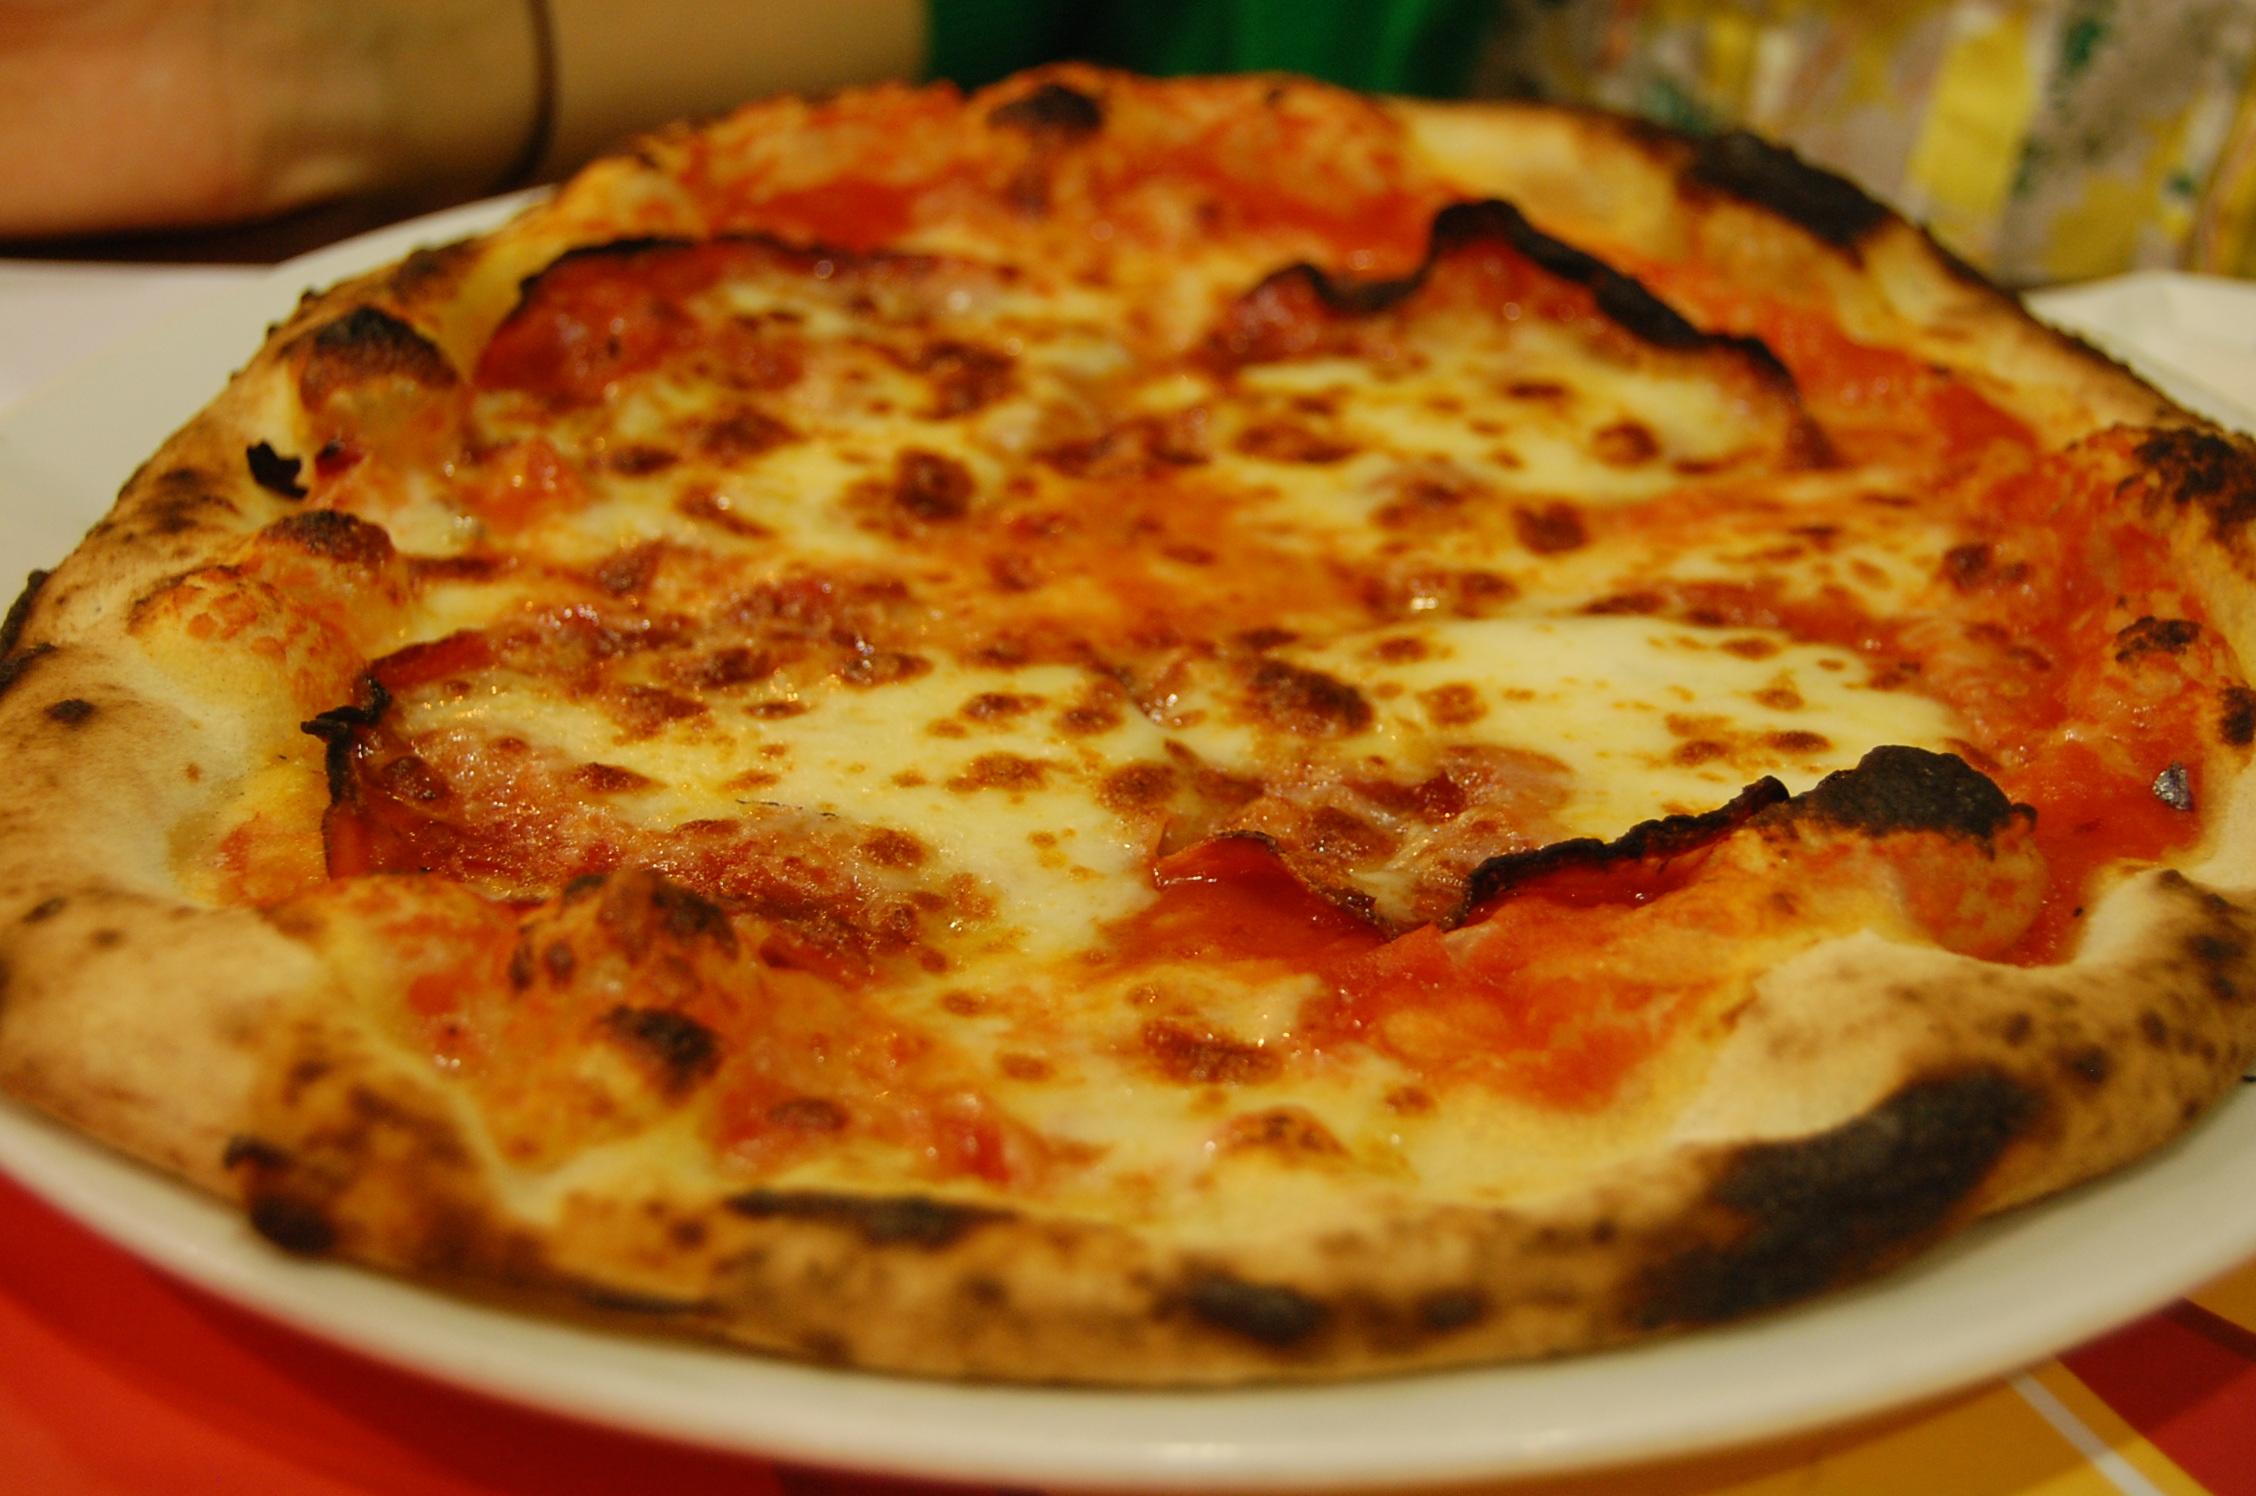 Pizzeria tonda best pizza in rome an american in rome for Pizza pizzeria